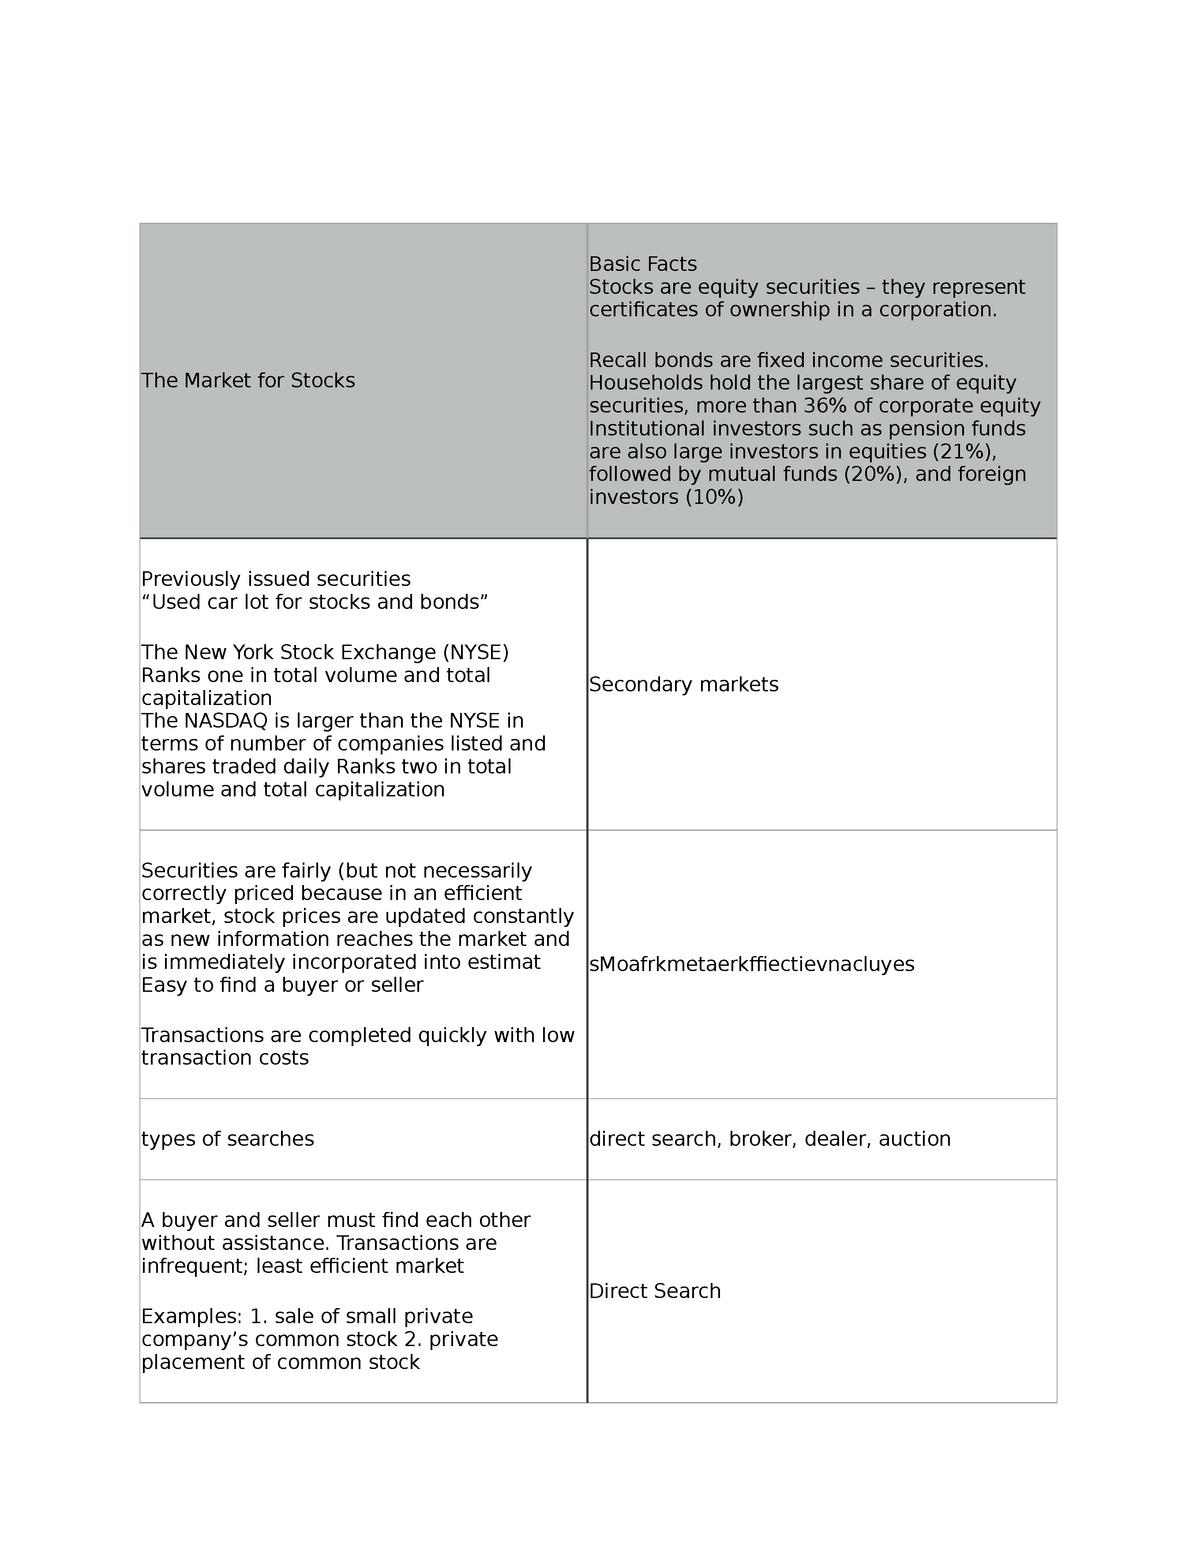 Finance 300 test 3 chapter 9 - FINC 300 : Fundamentals of